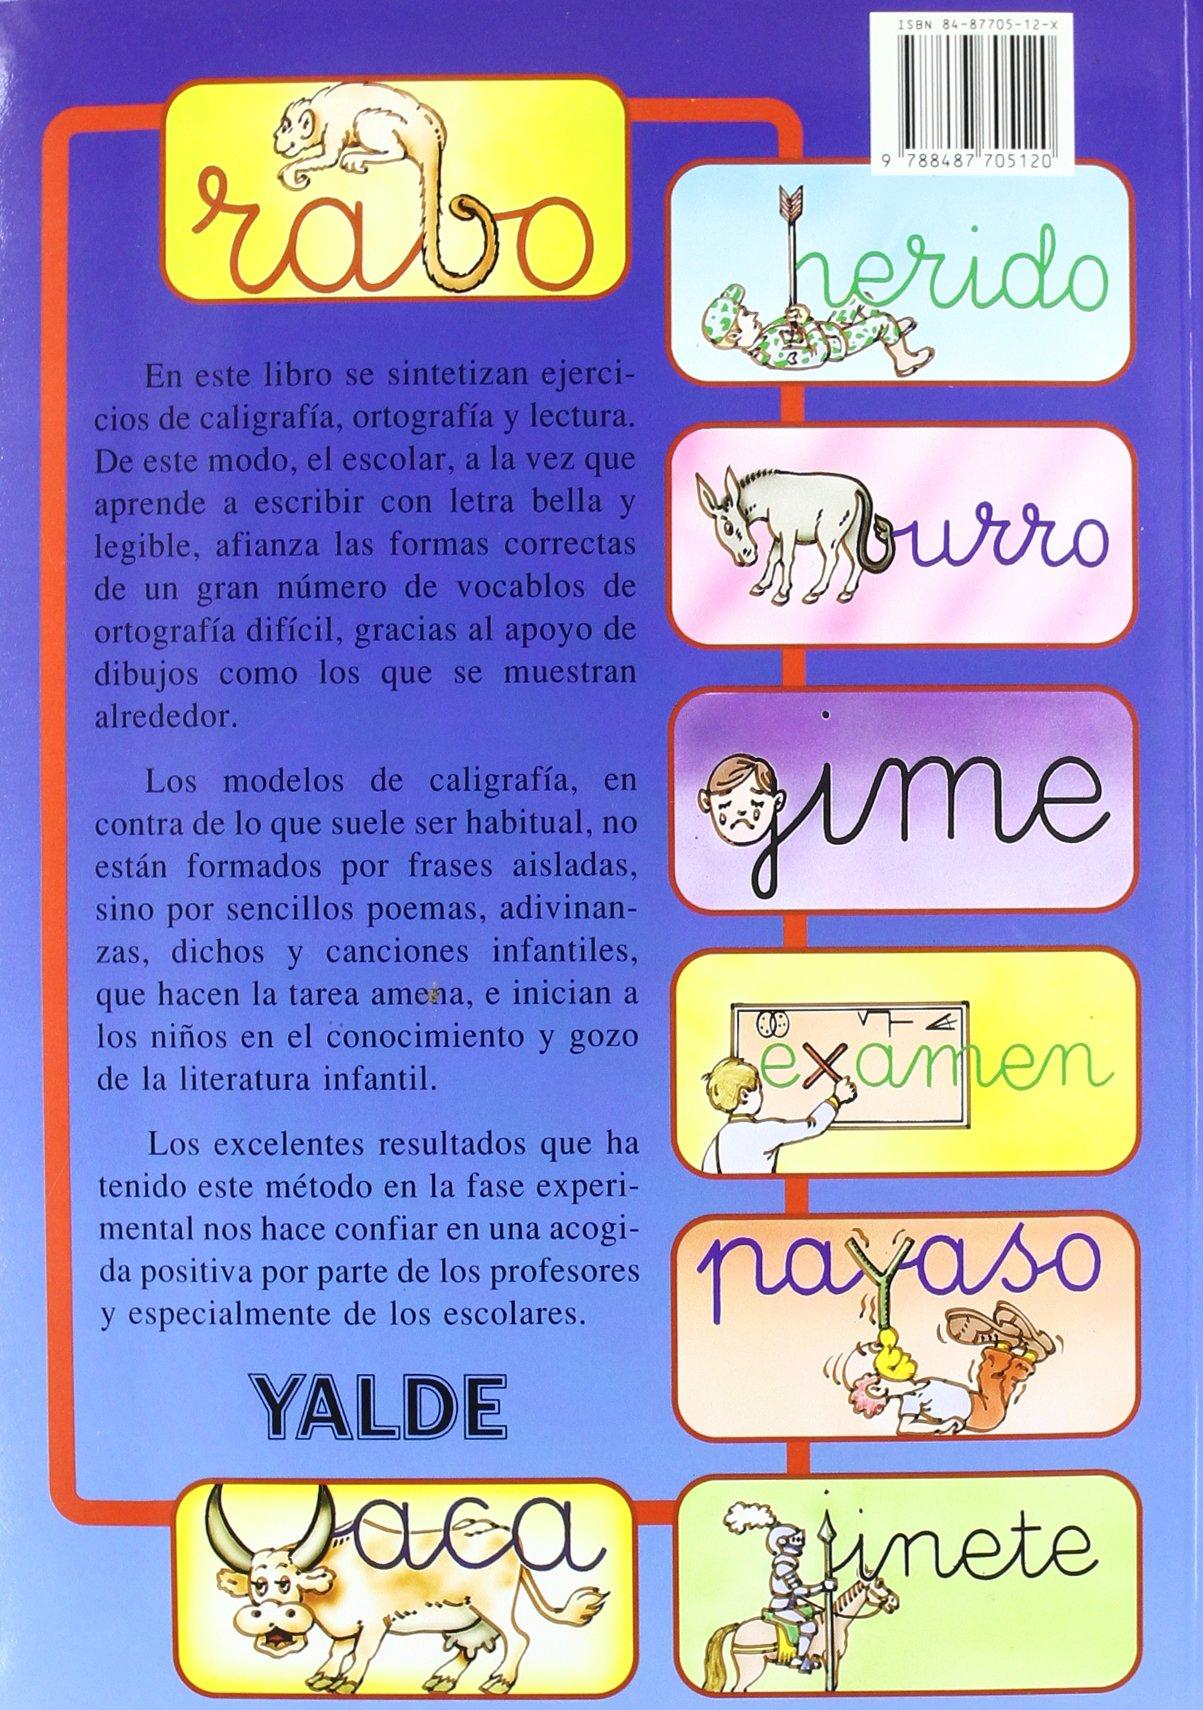 Caligrafía, ortografía, lectura. Nivel 1: Manuel Sanjuán Nájera: 9788487705120: Amazon.com: Books